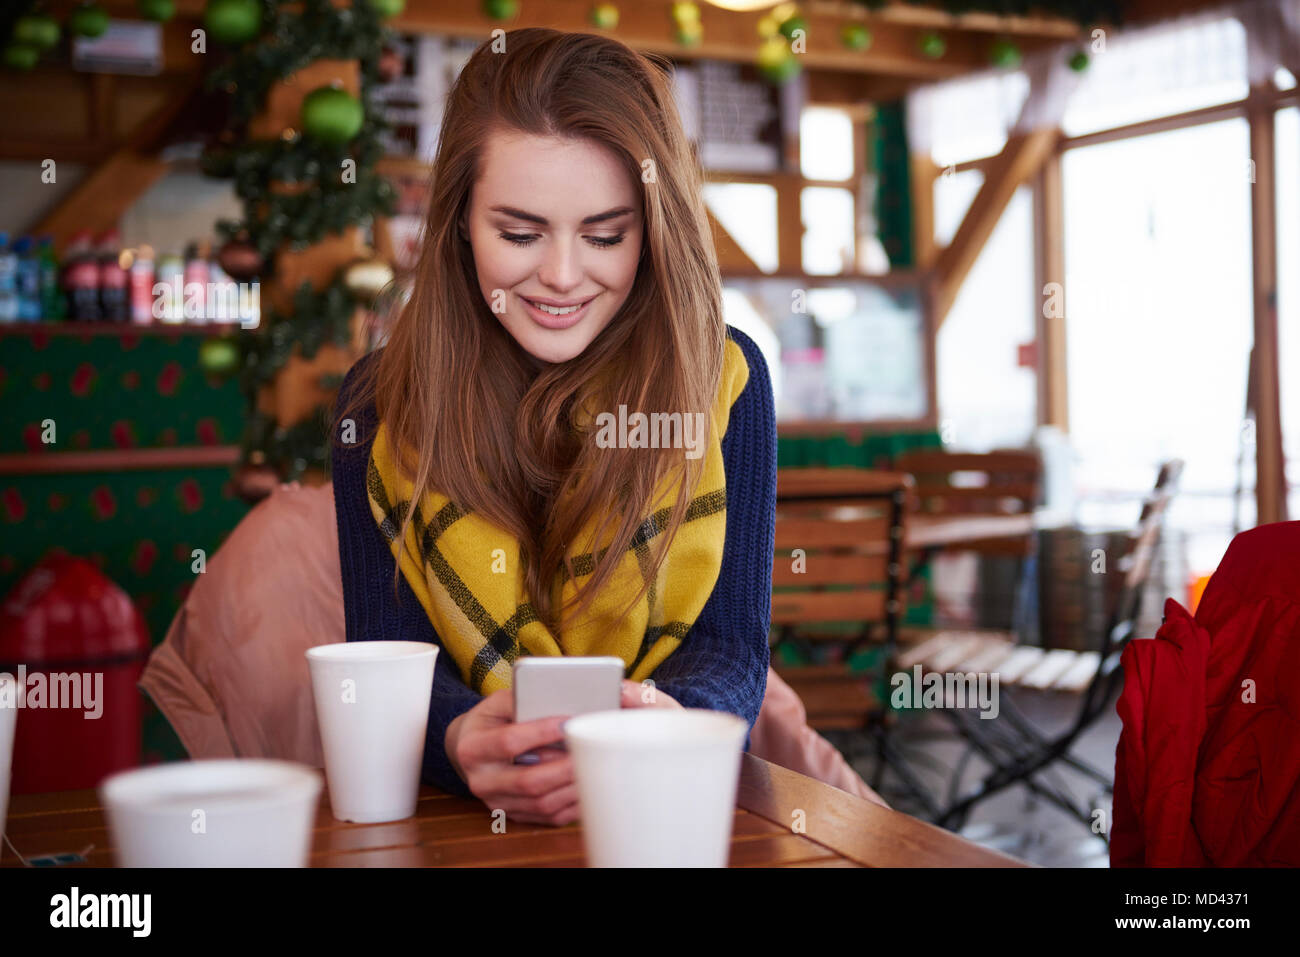 Junge Frau über SMS auf Handy lächeln Stockbild